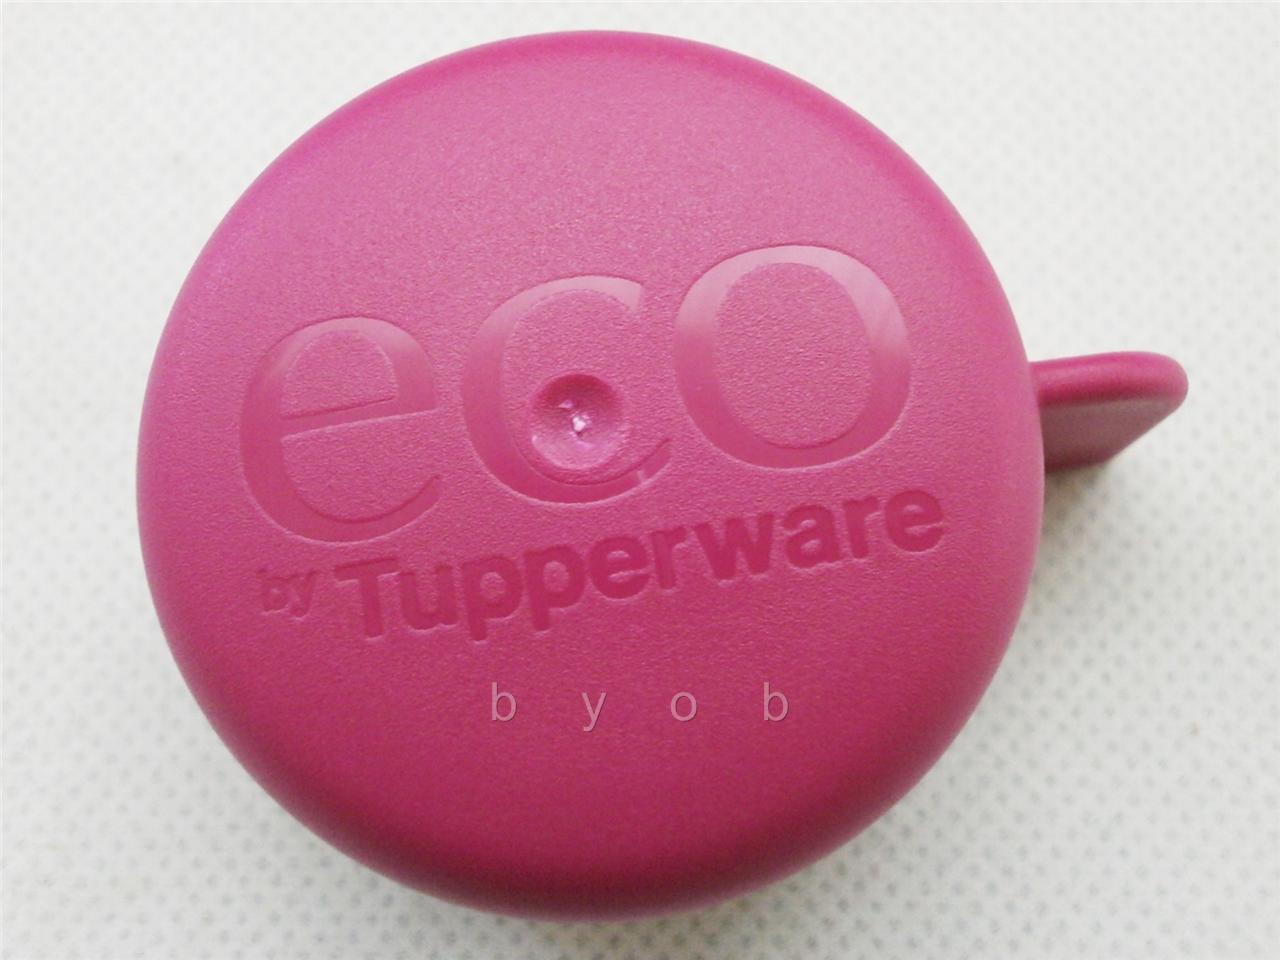 brand new tupperware eco bottle 750 ml tumblers bpa free 5 multi colors ebay. Black Bedroom Furniture Sets. Home Design Ideas